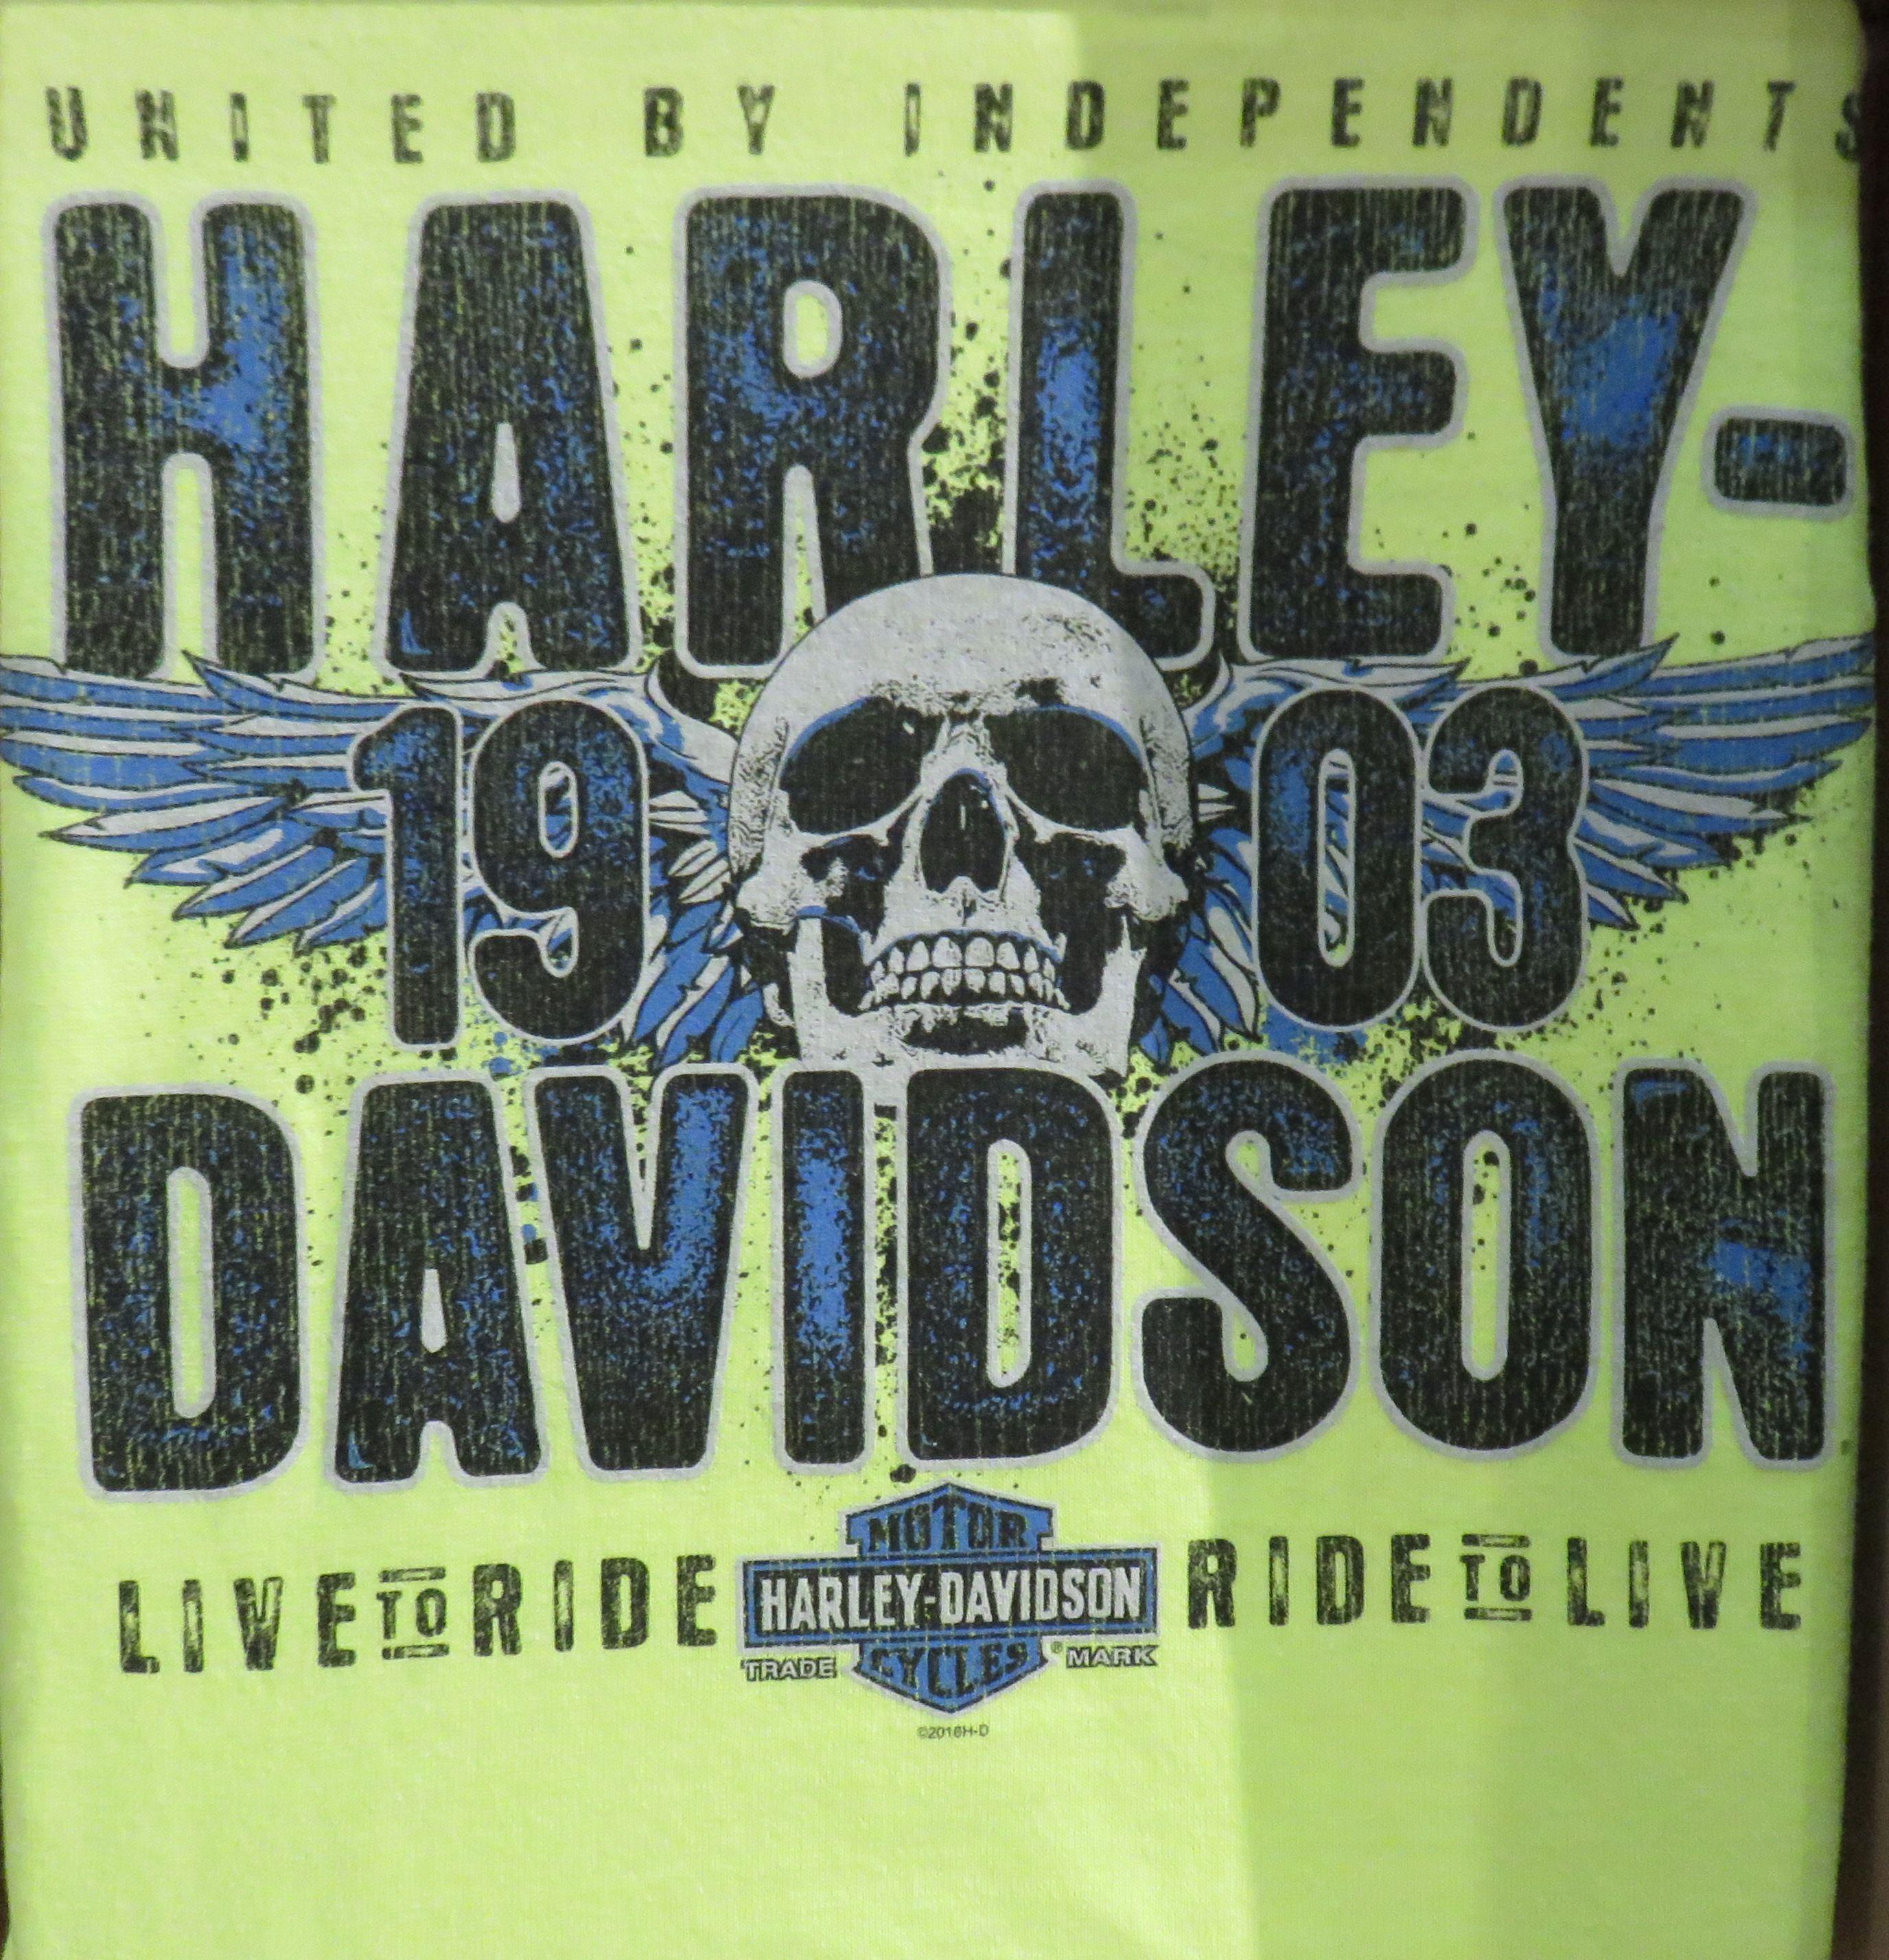 Harley Davidson Quotes Harleydavidson Tshirt  Robert  Pinterest  Harley Davidson